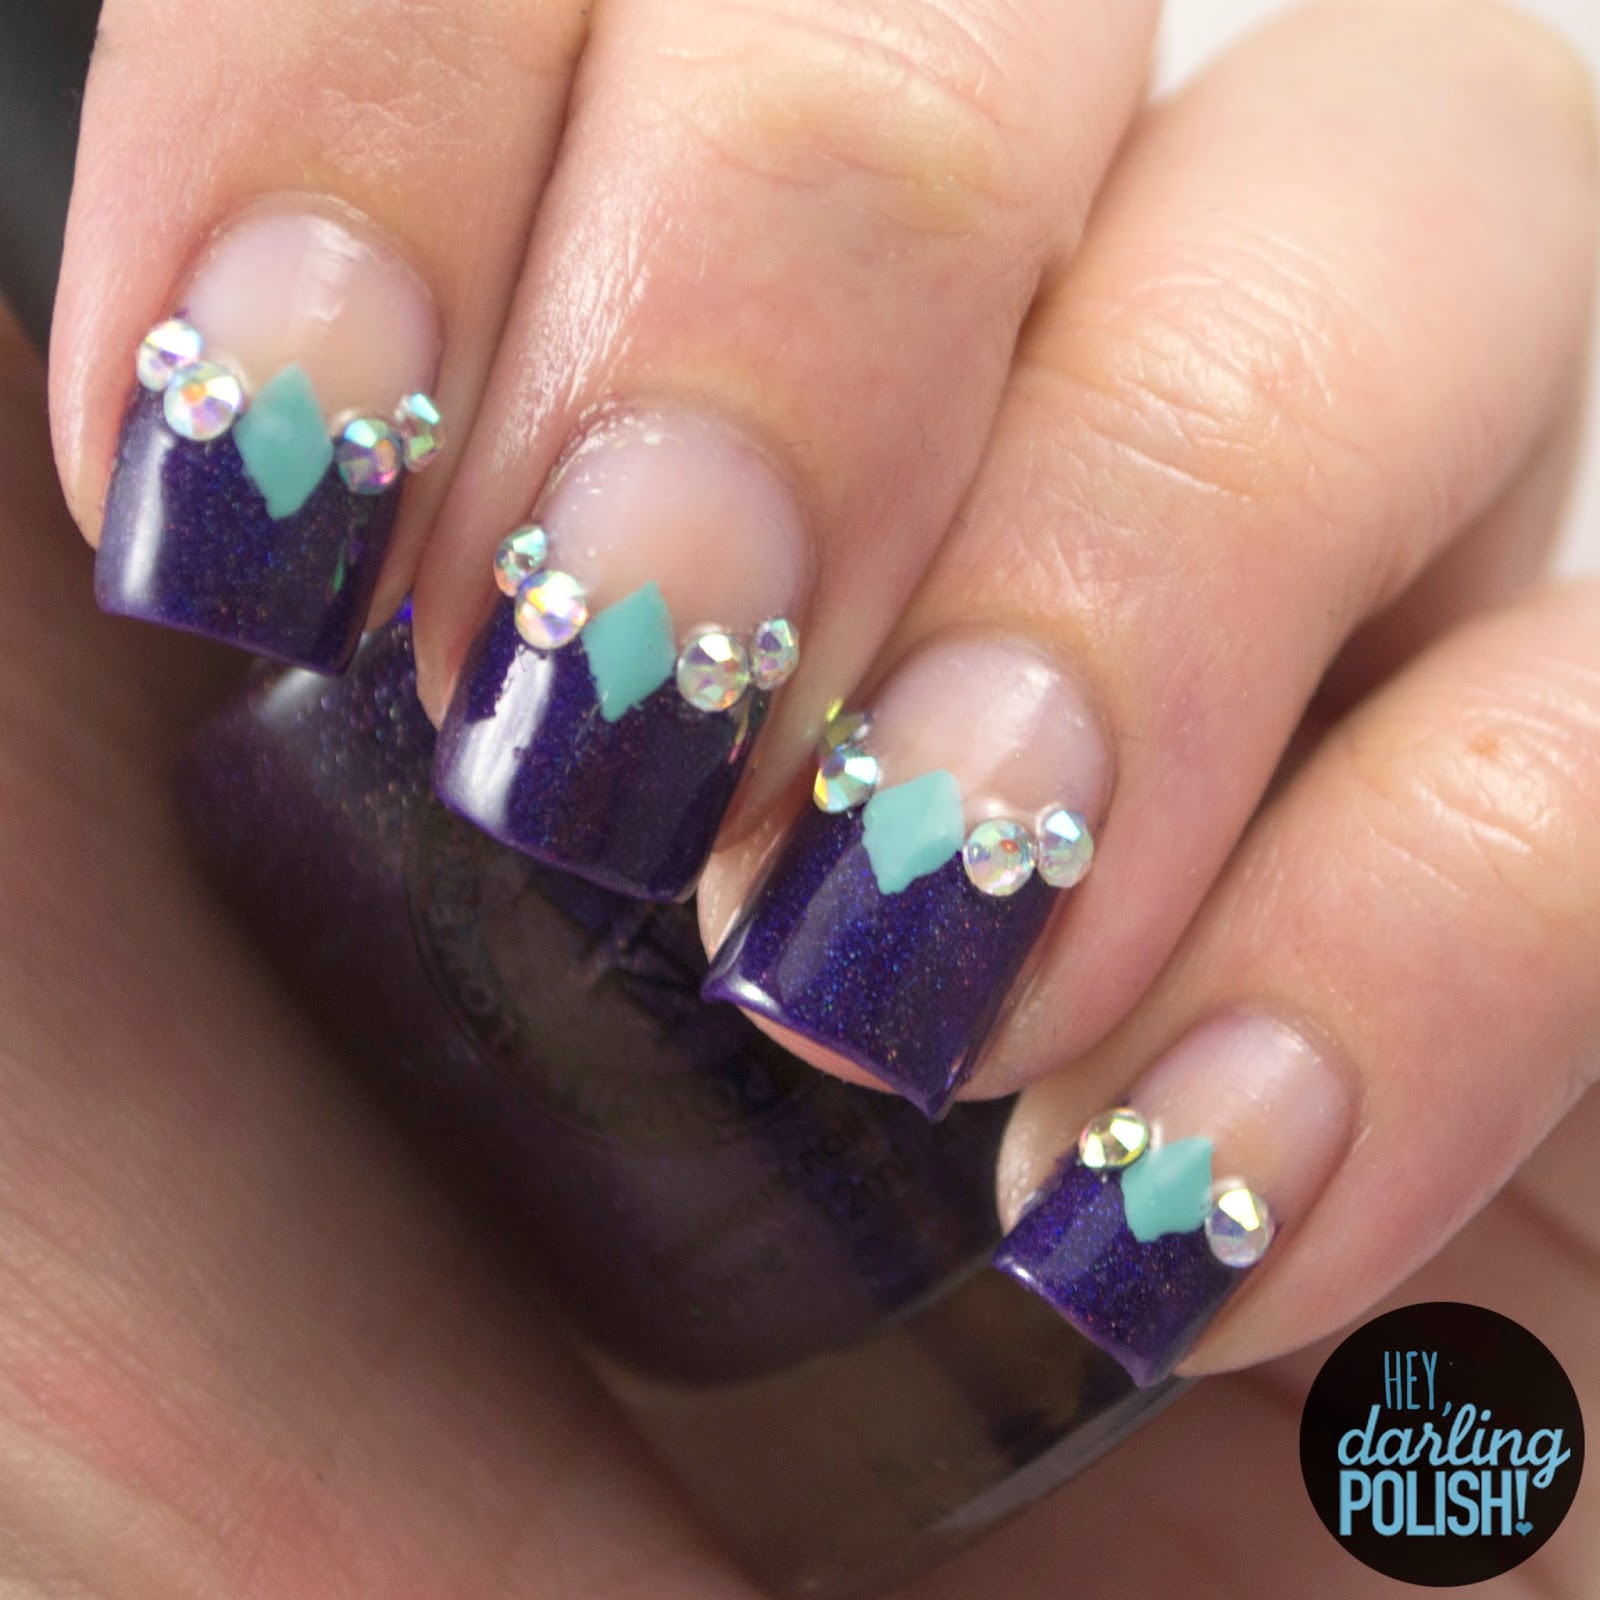 nails, nail art, nail polish, polish, i love nail polish, grape-alicious, negative space, rhinestones, theme buffet